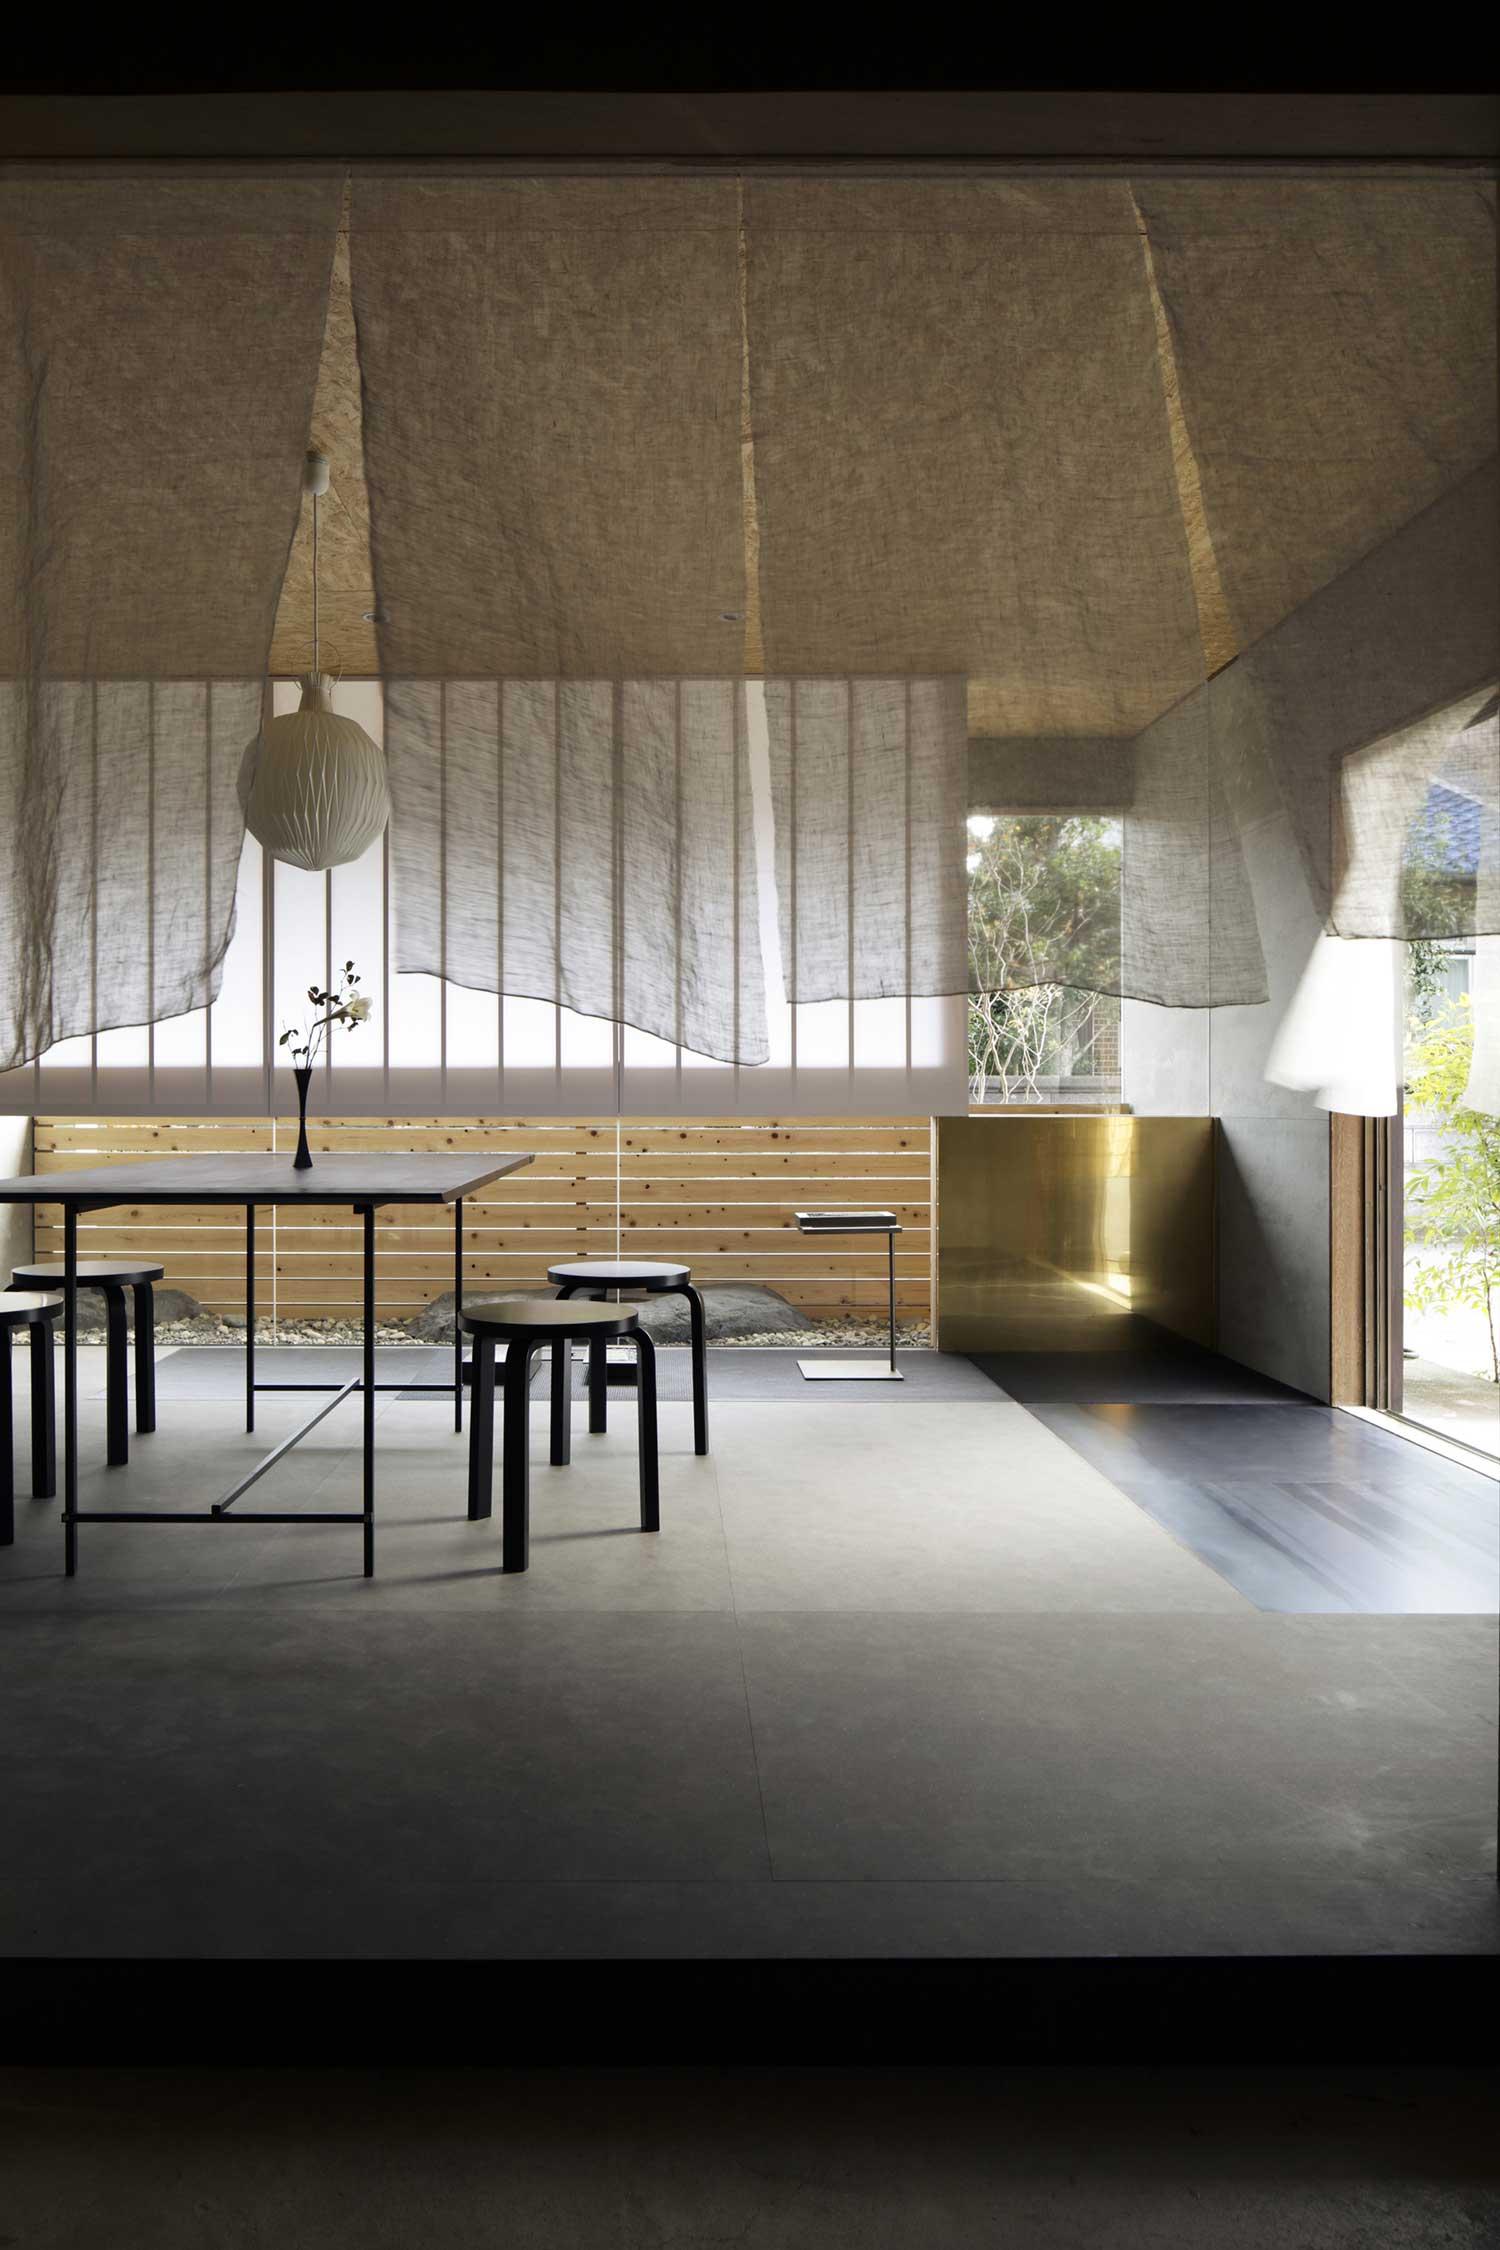 Enzo Gallery & Office by Ogawasekkei | Yellowtrace